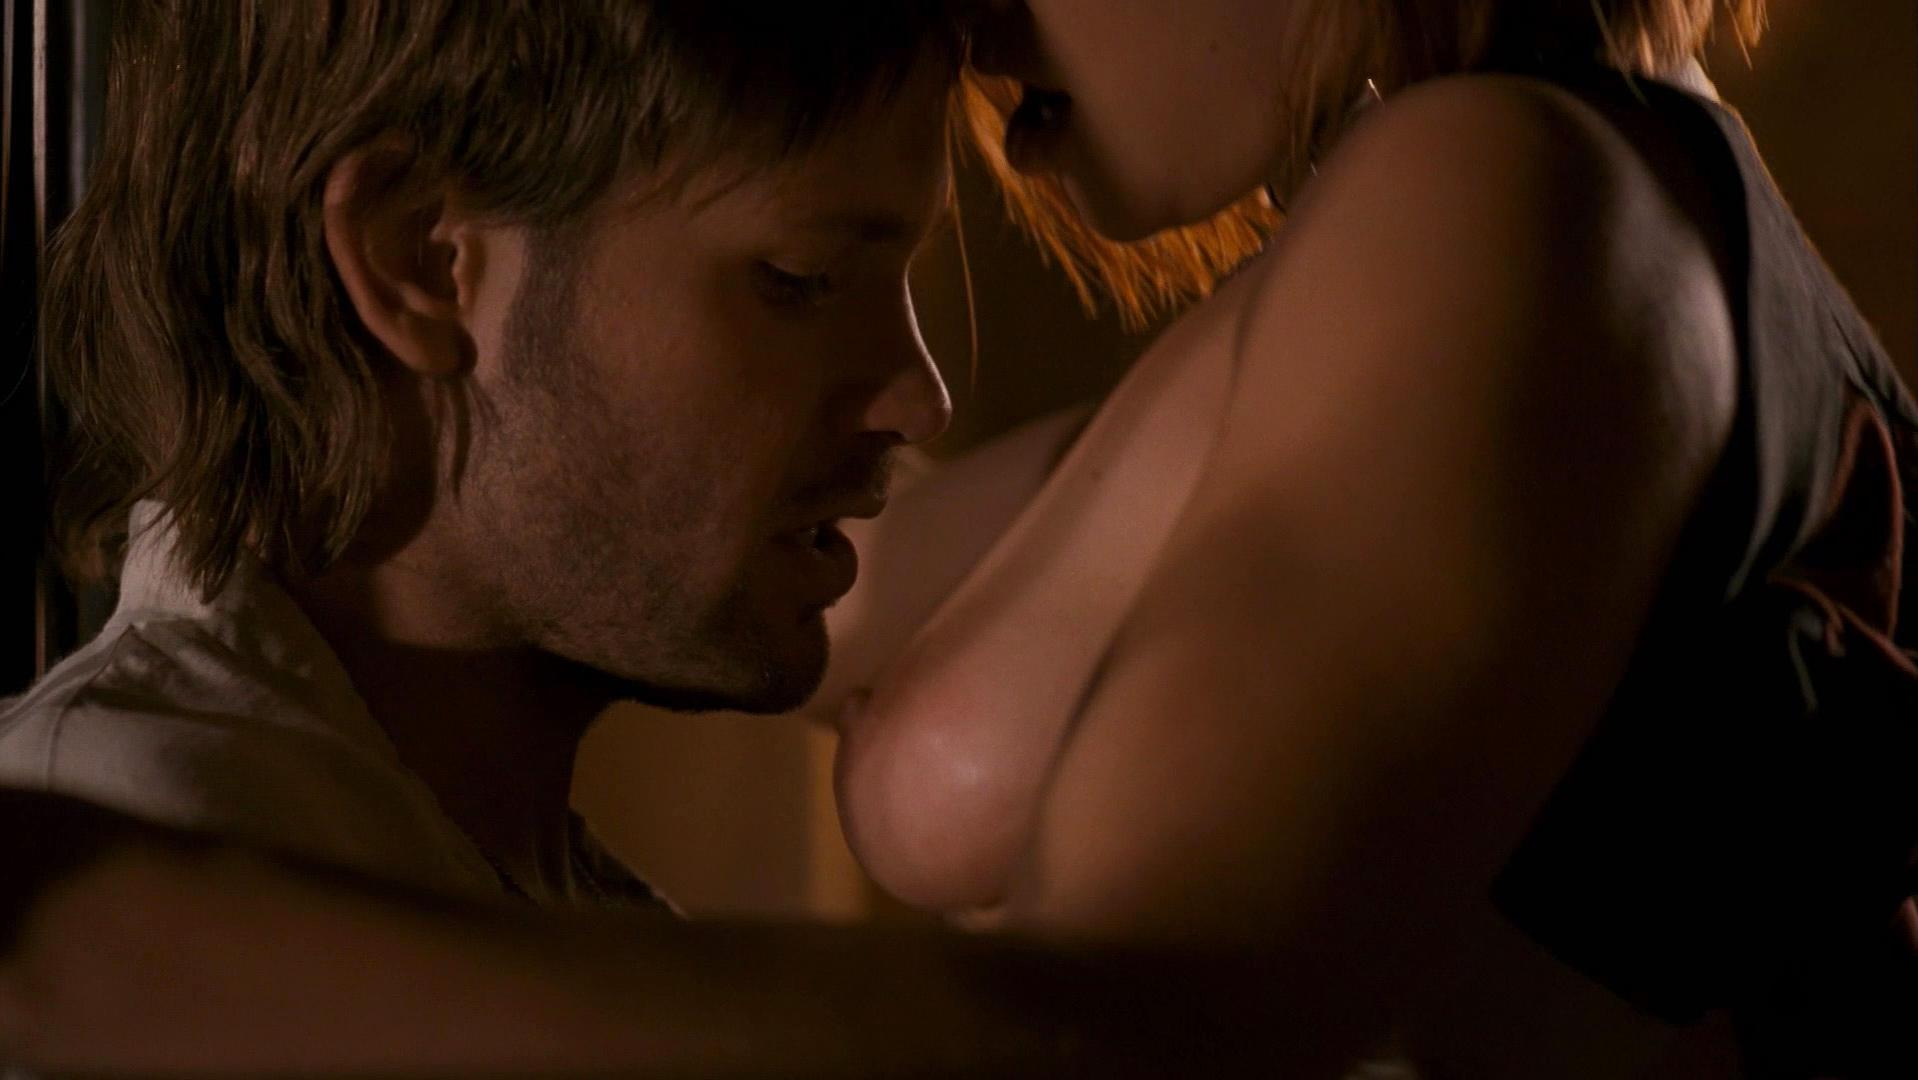 Kristin loken sex scences